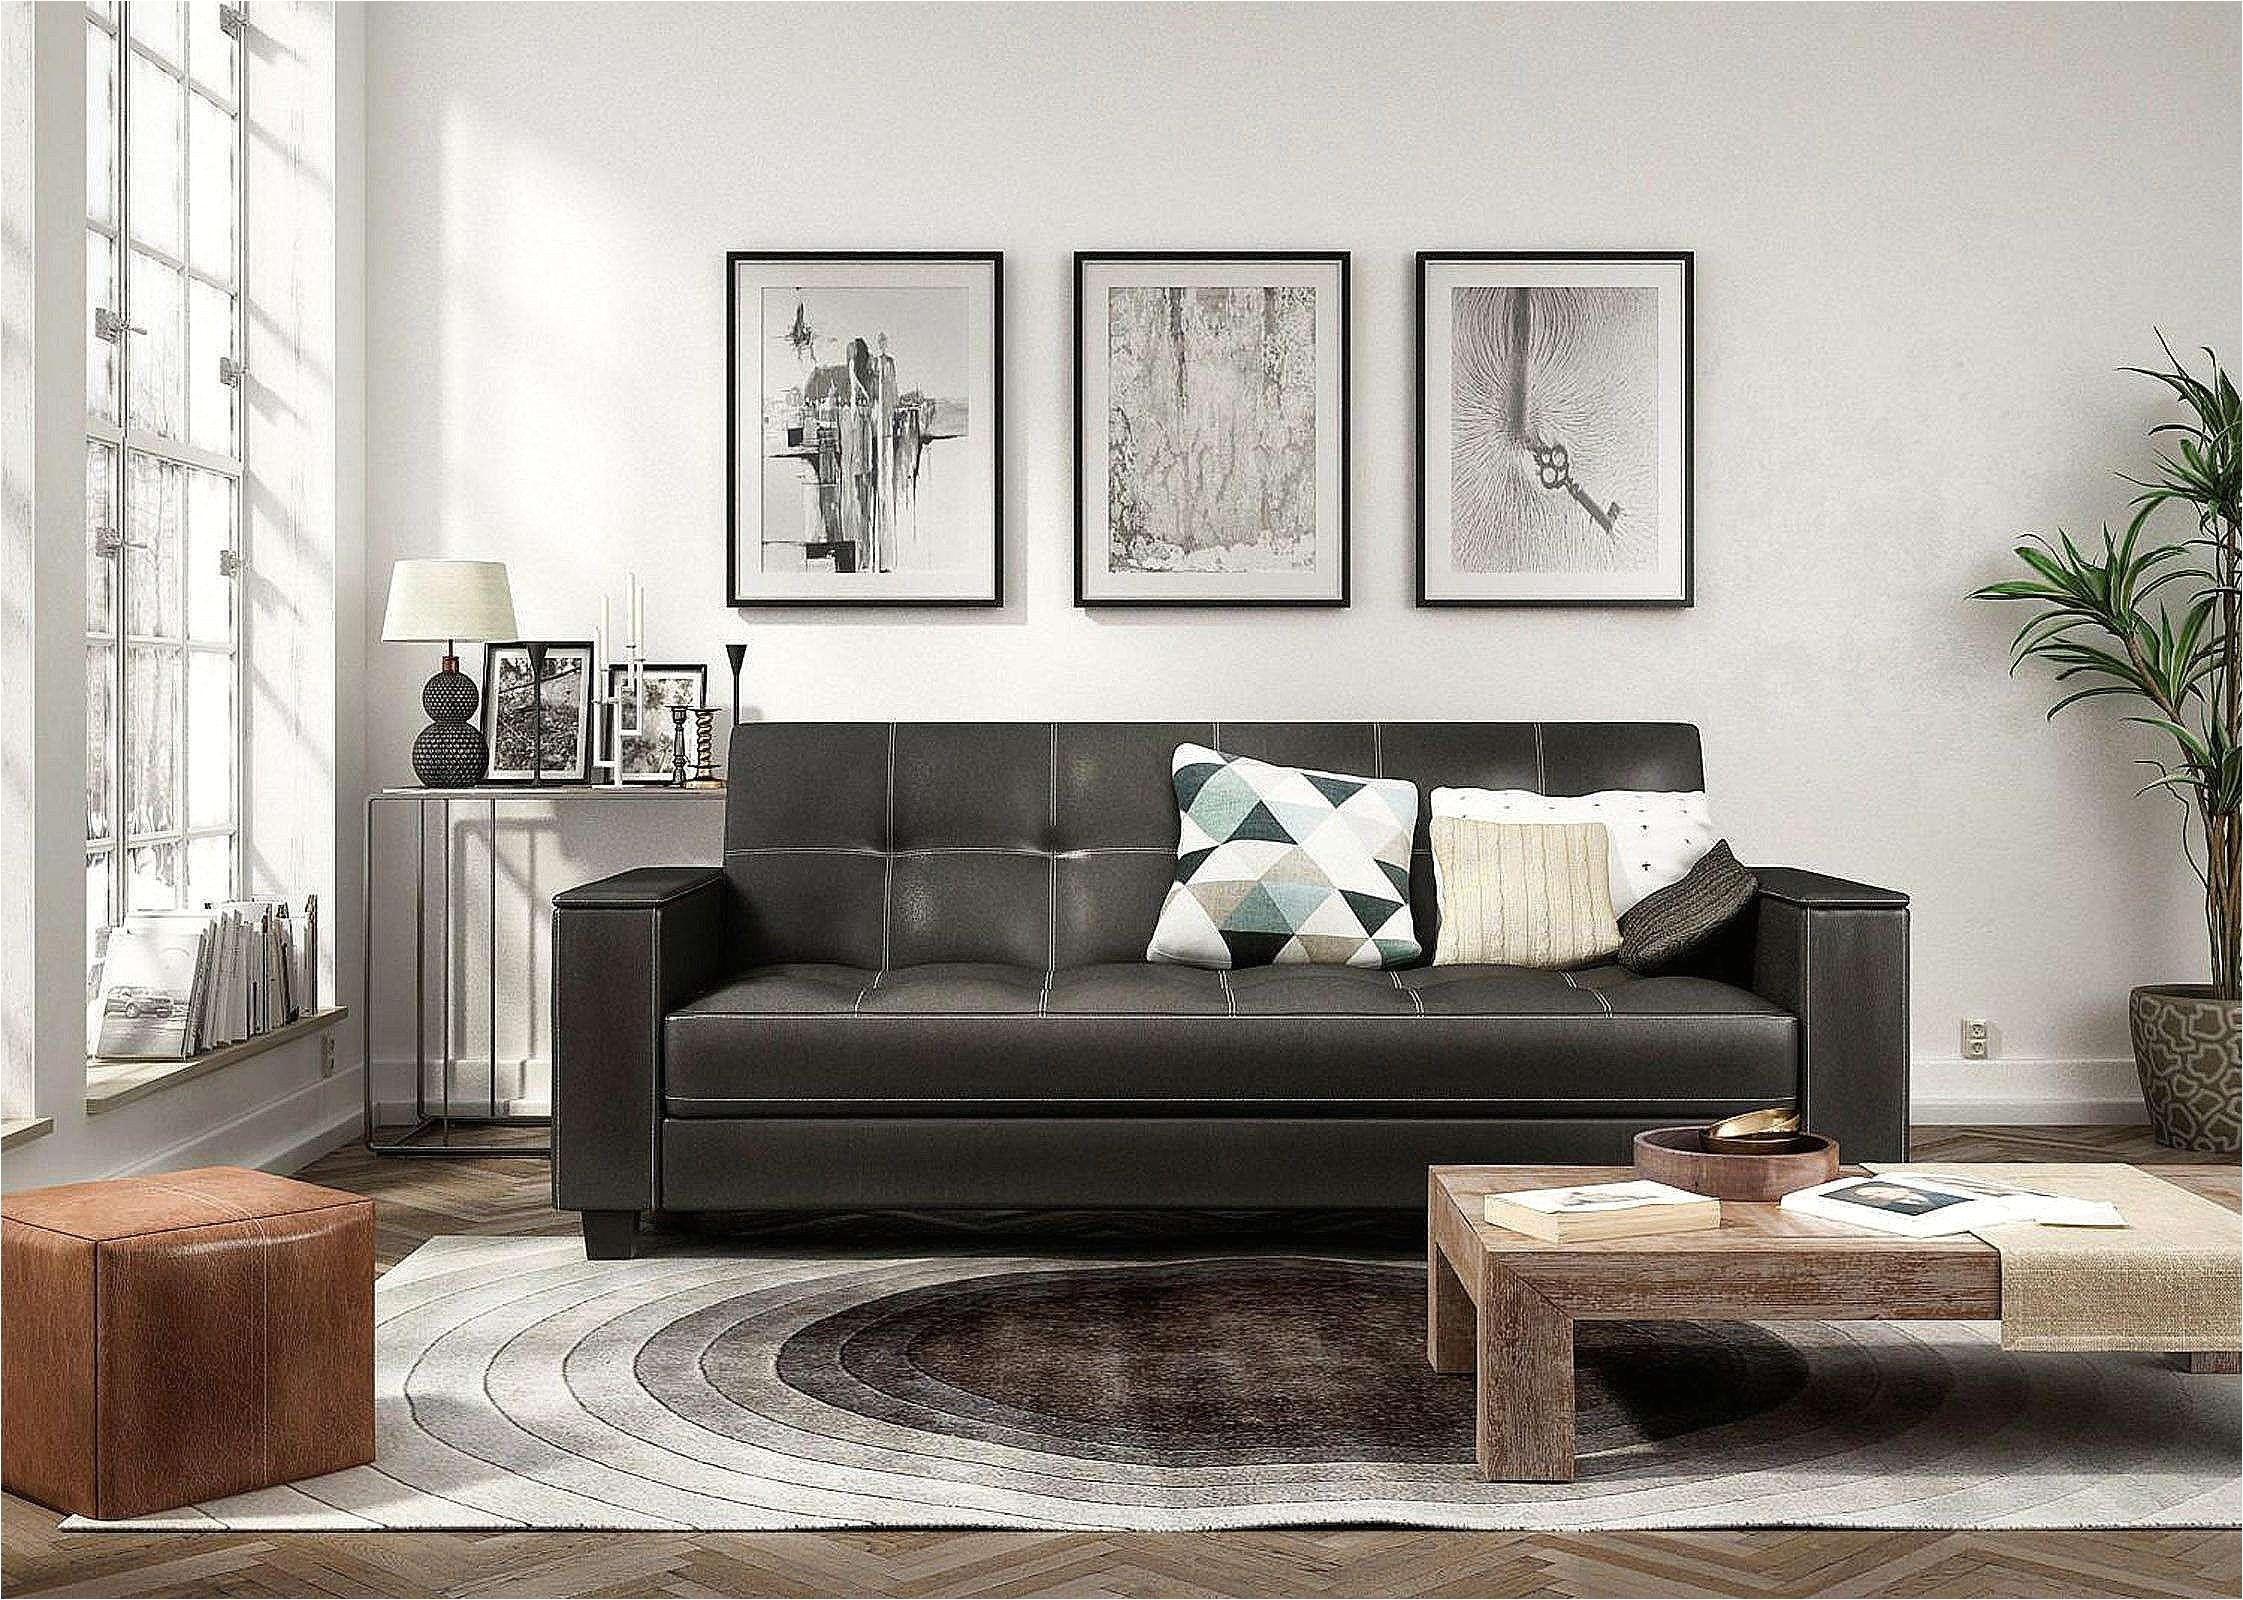 Latest sofa Designs Lovely Modern Living Room Furniture New Gunstige sofa Macys Furniture 0d